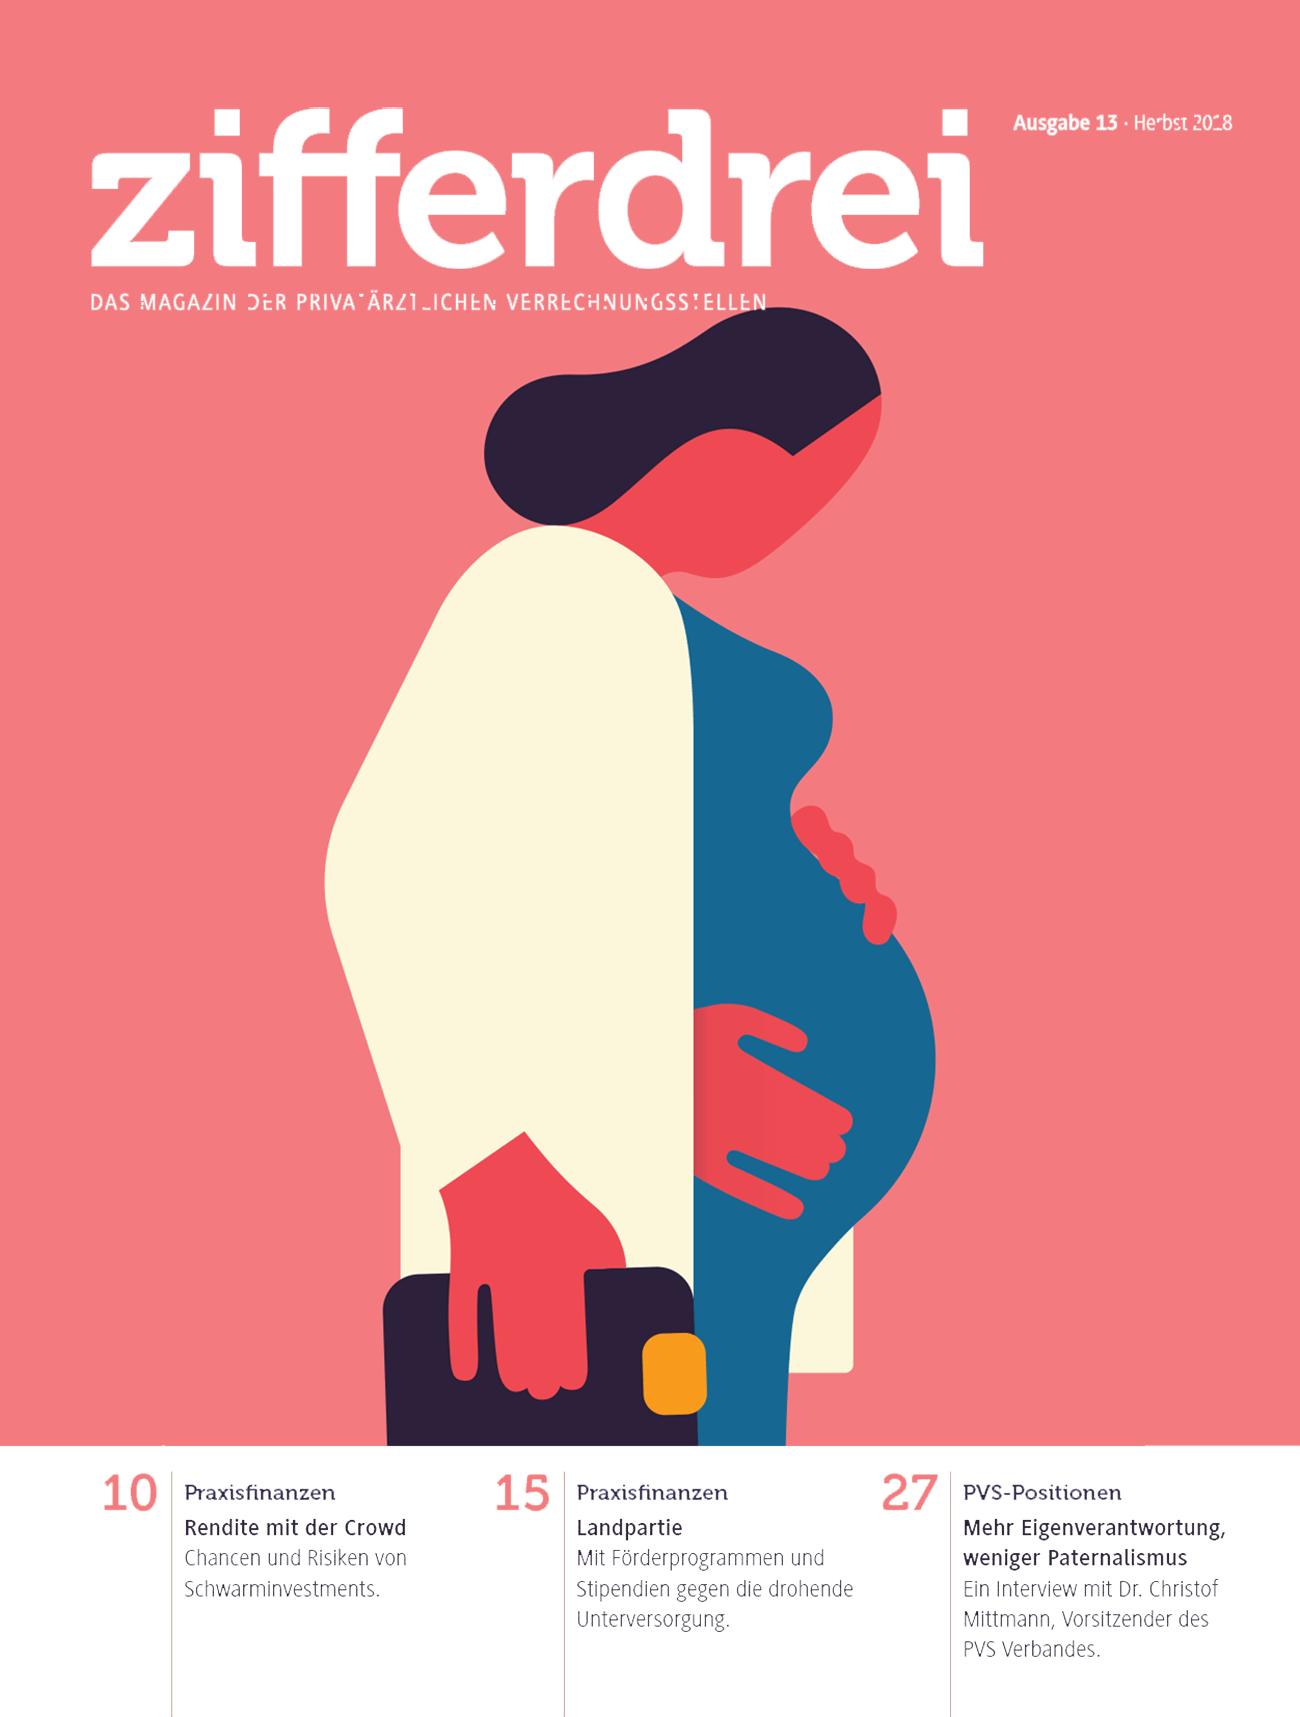 Too much or too little? Zifferdrei